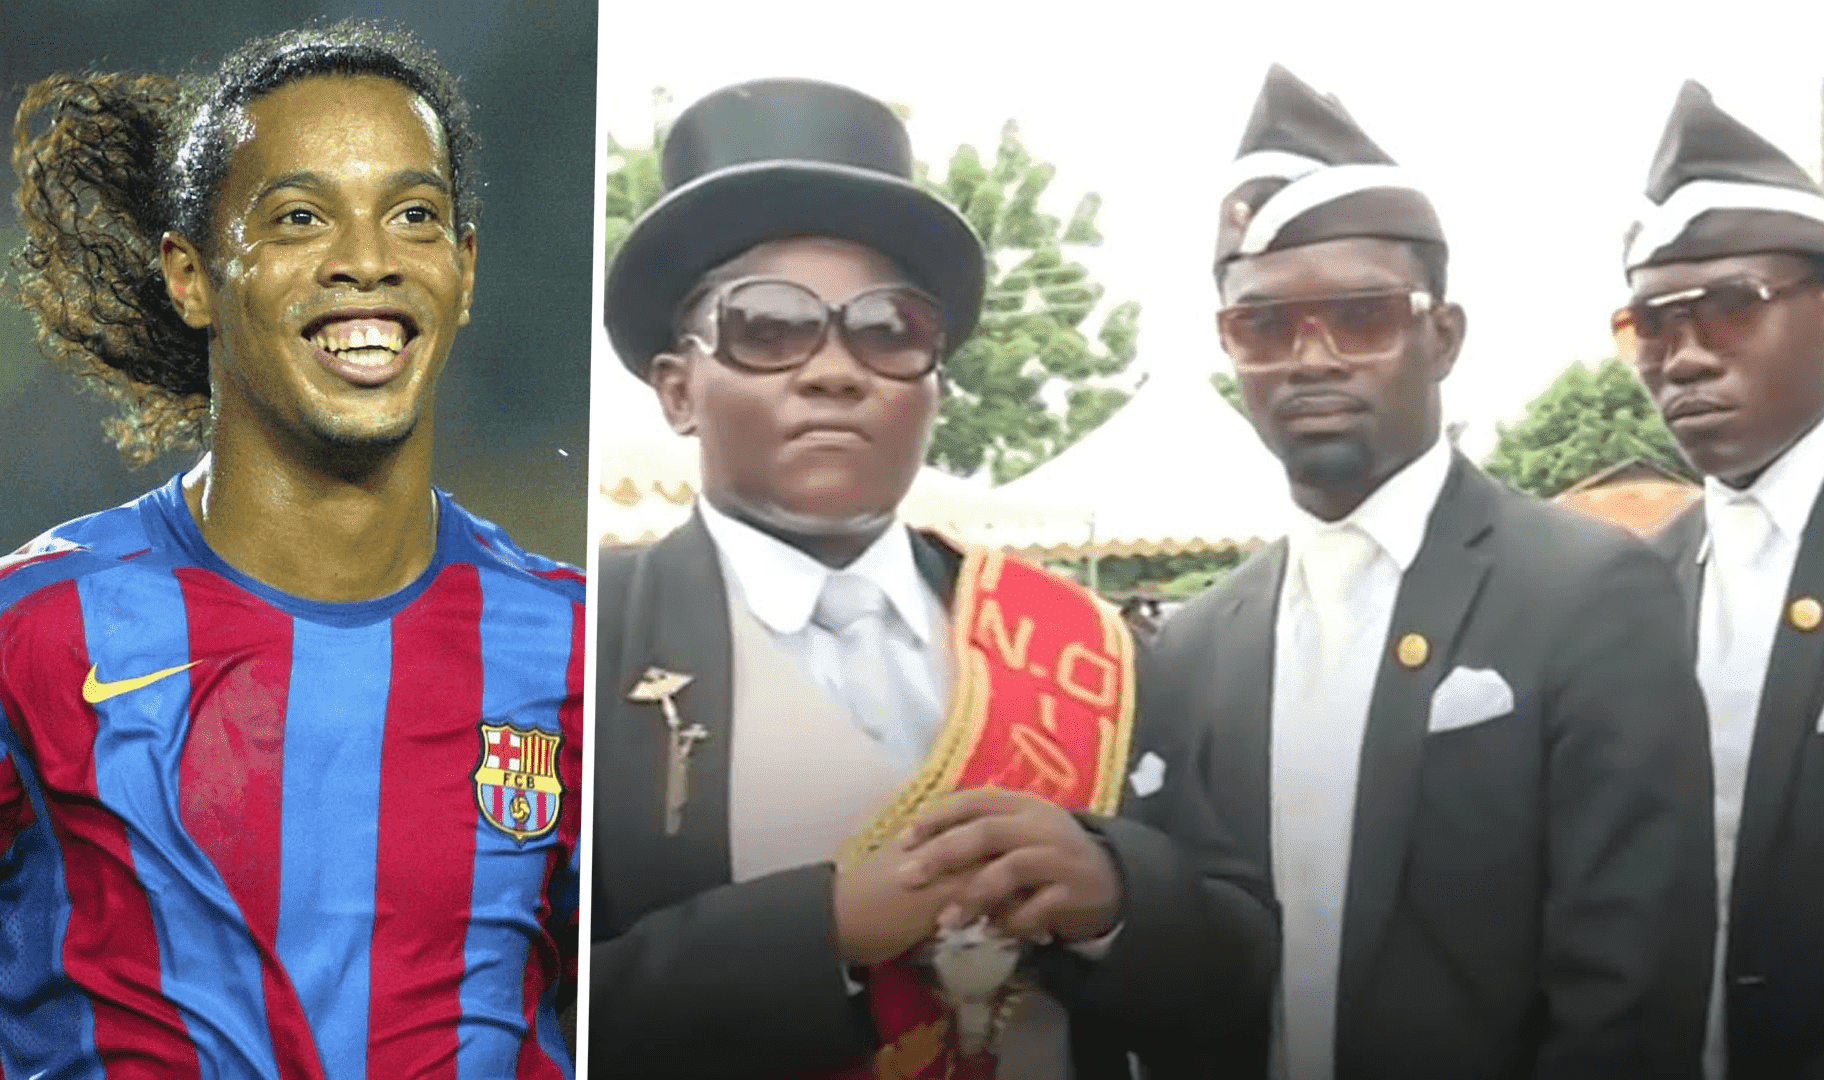 Un porteur de cercueil  rêve de conduire Ronaldinho jusqu'à sa dernière demeure